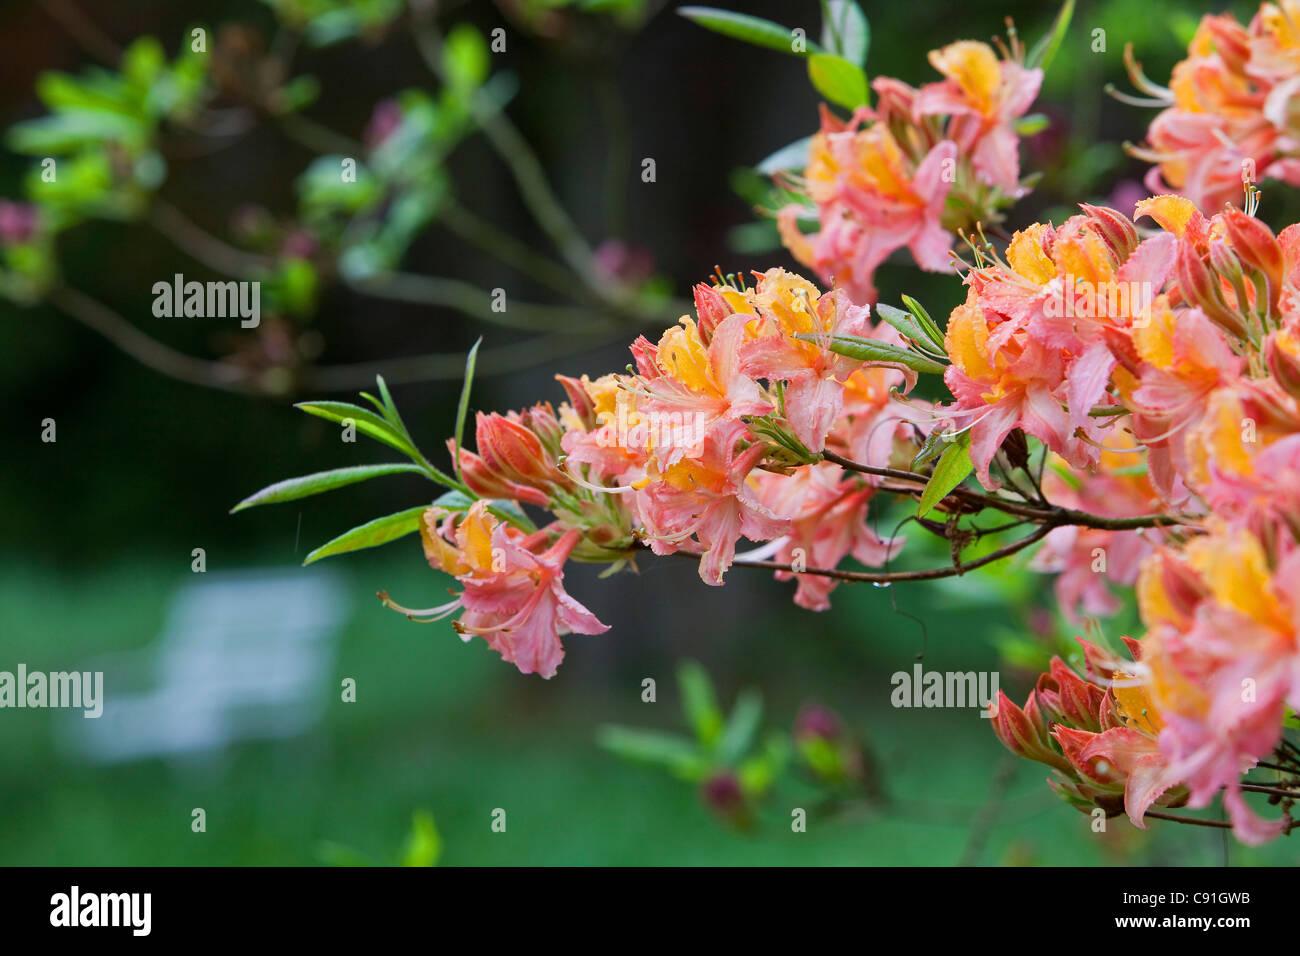 Flowering azaleas in full bloom in Breidings garden, Soltau, Lower Sayony, Germany - Stock Image